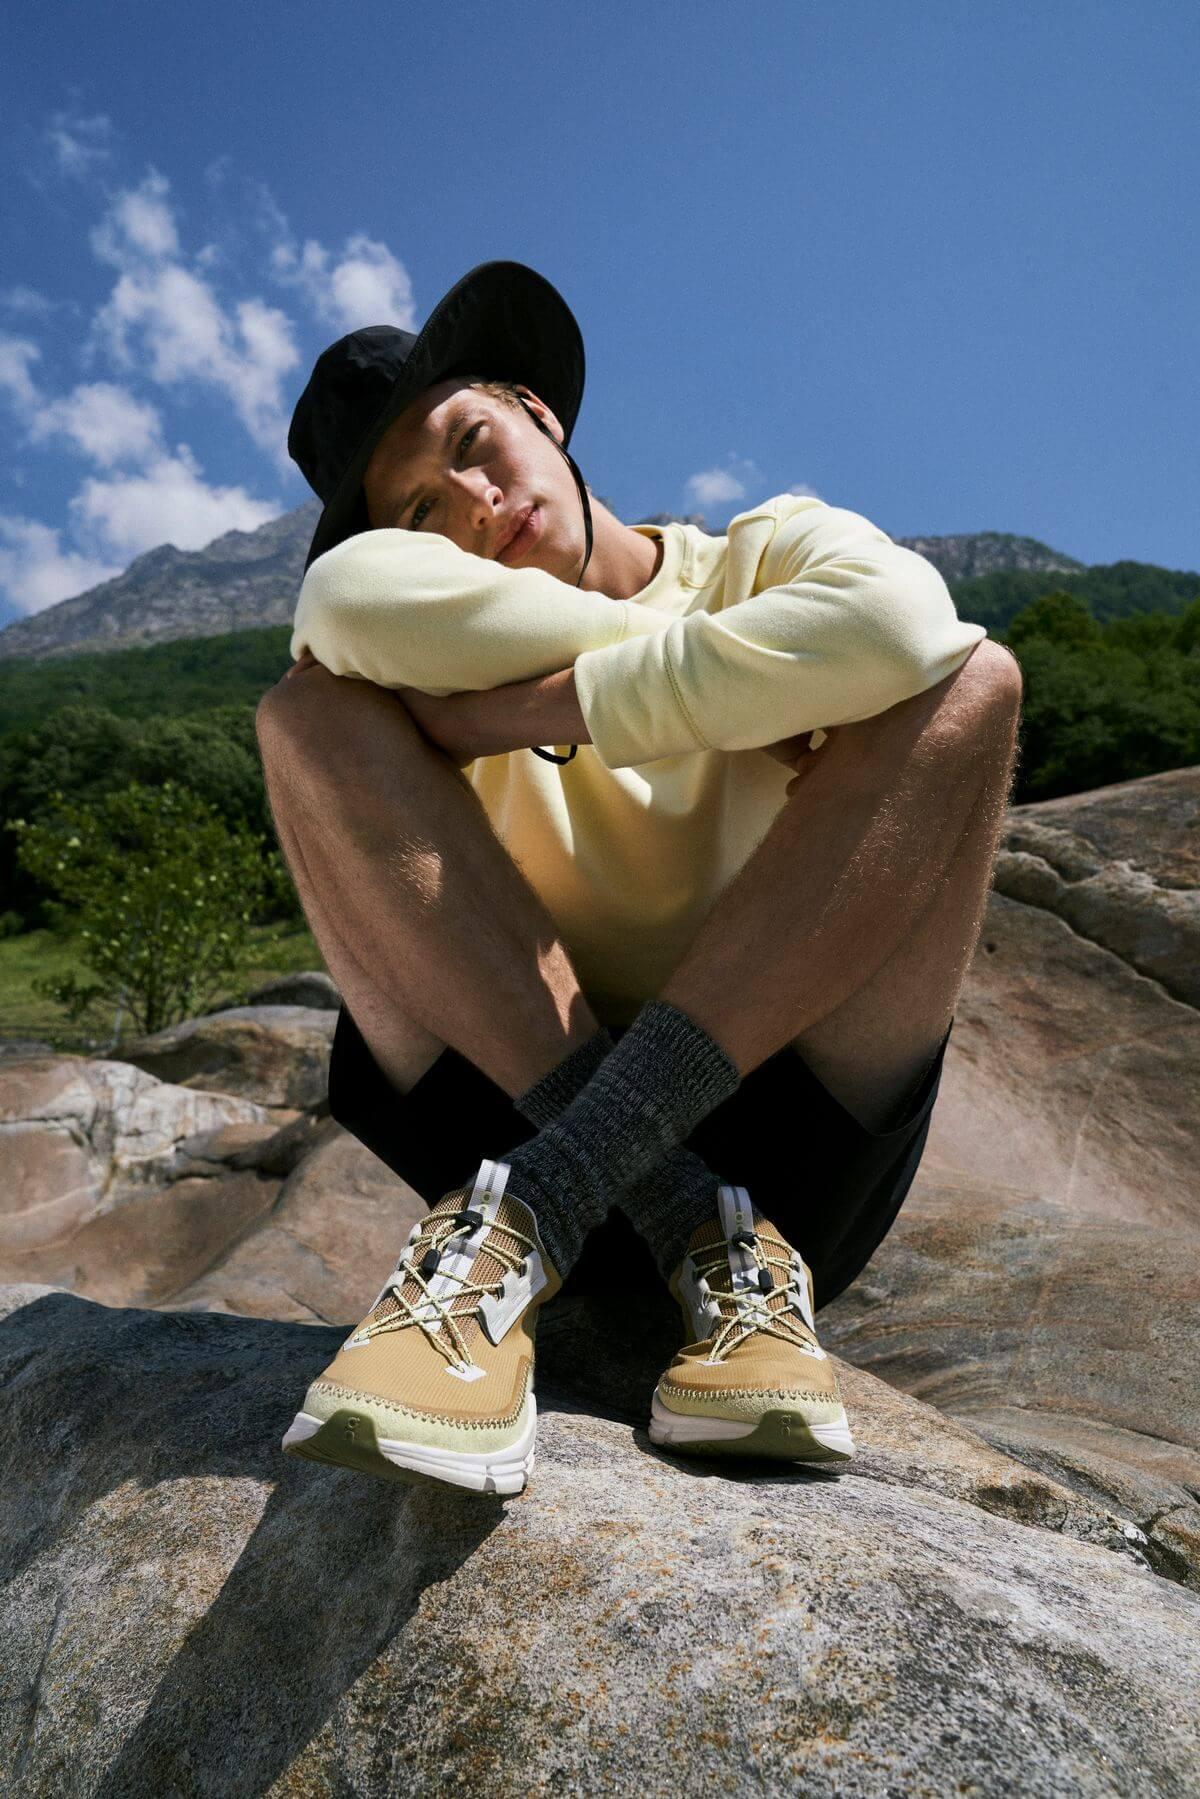 On Cloudaway - ein Hybrid-Outdoor-Schuh/Sneaker